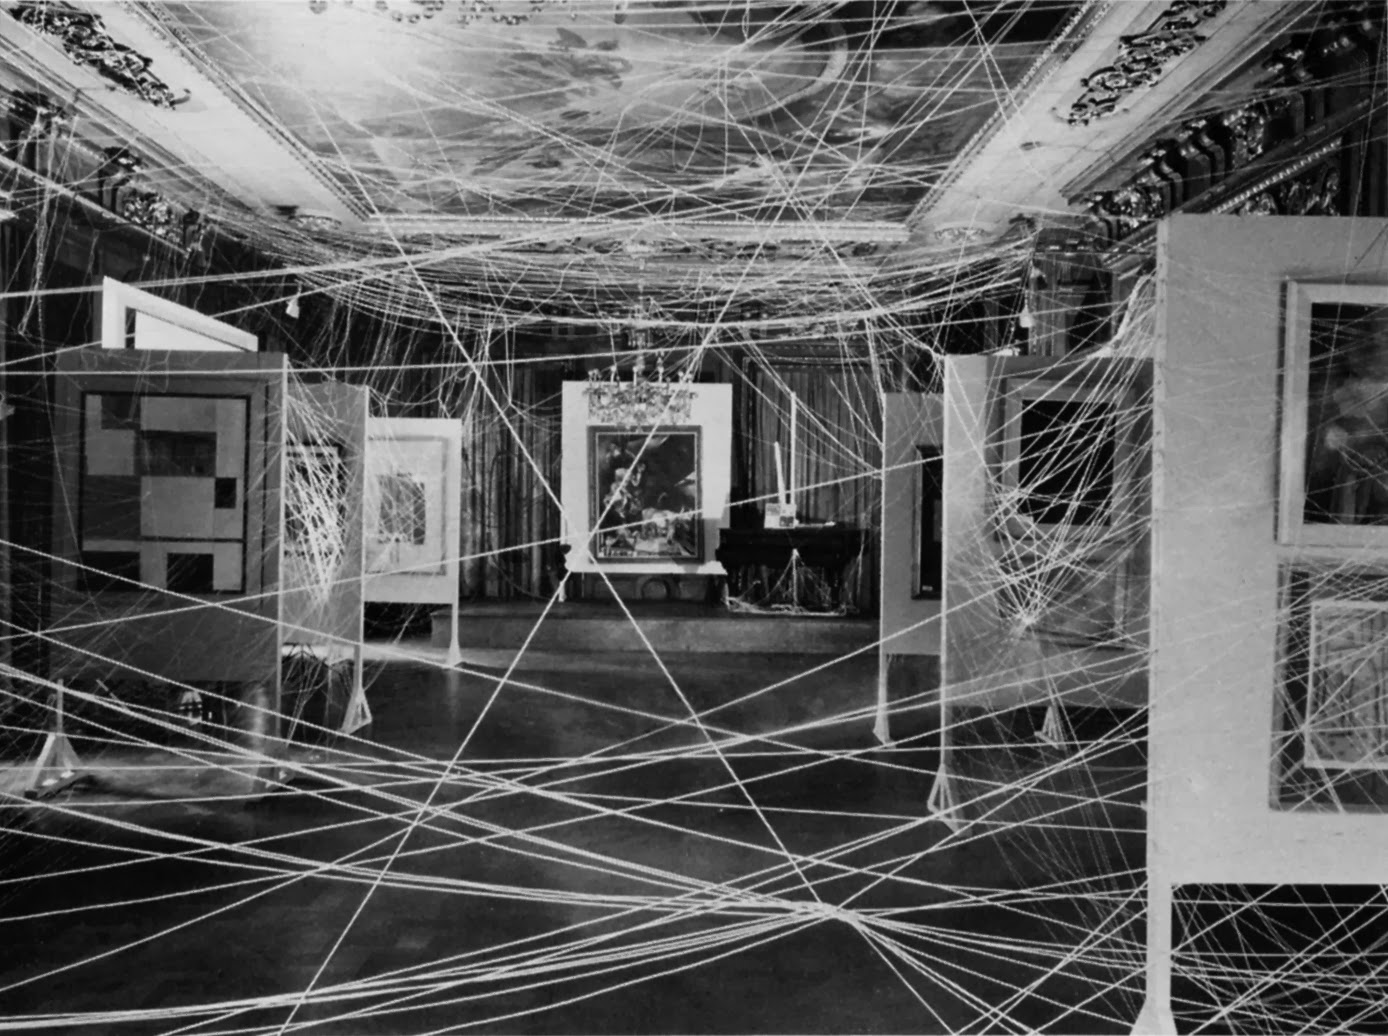 D Art Exhibition Ipoh : Artplastoc marcel duchamp quatrième